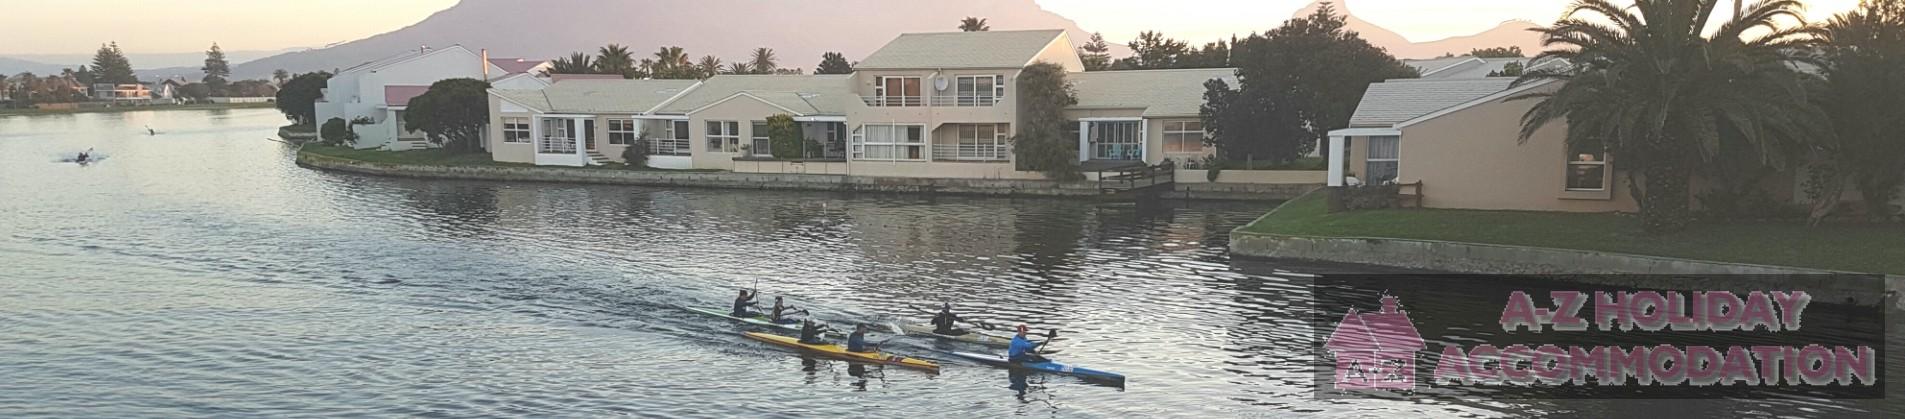 http://www.a-zholidayhomes.co.za/wp-content/uploads/2017/09/A-Z_Header_Milnerton_Lagoon_Canoeing.jpg